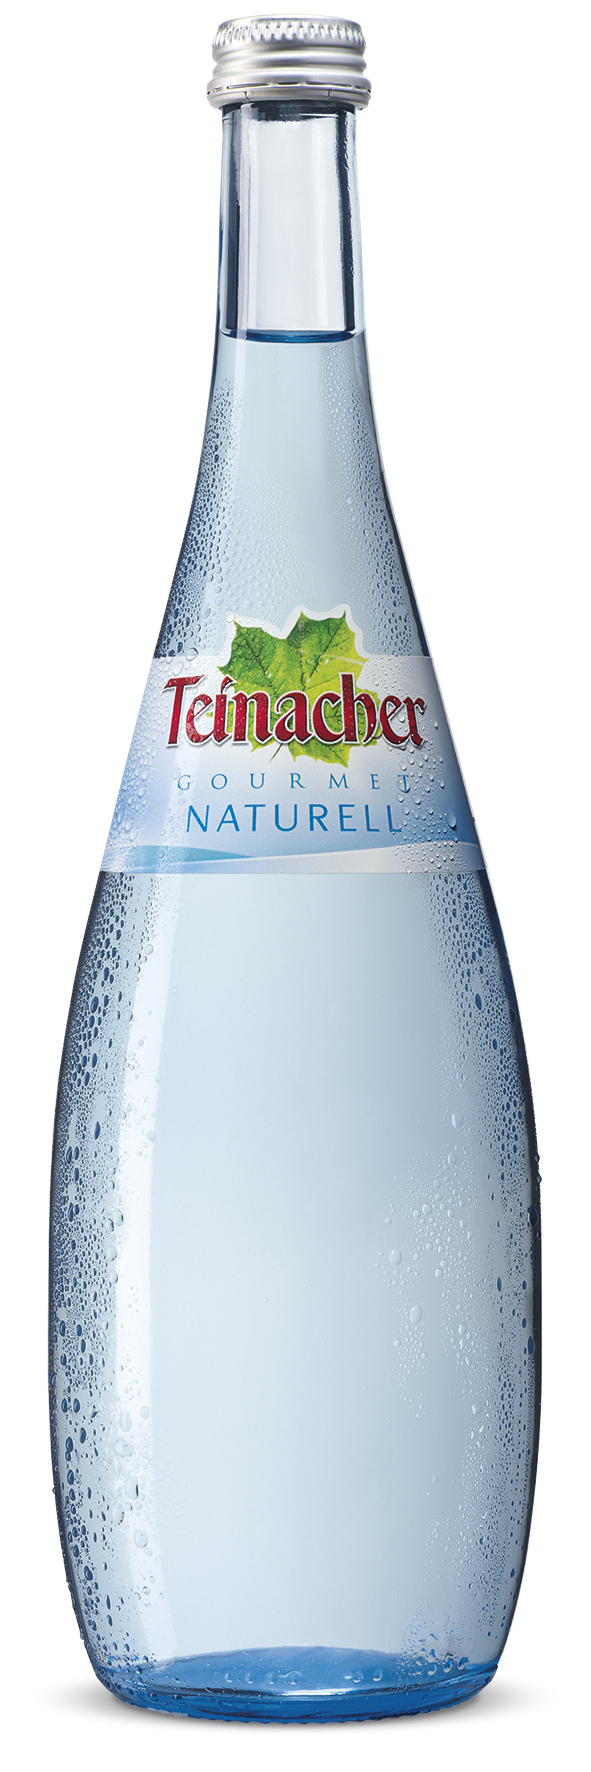 Teinacher Gourmet naturell 0,75